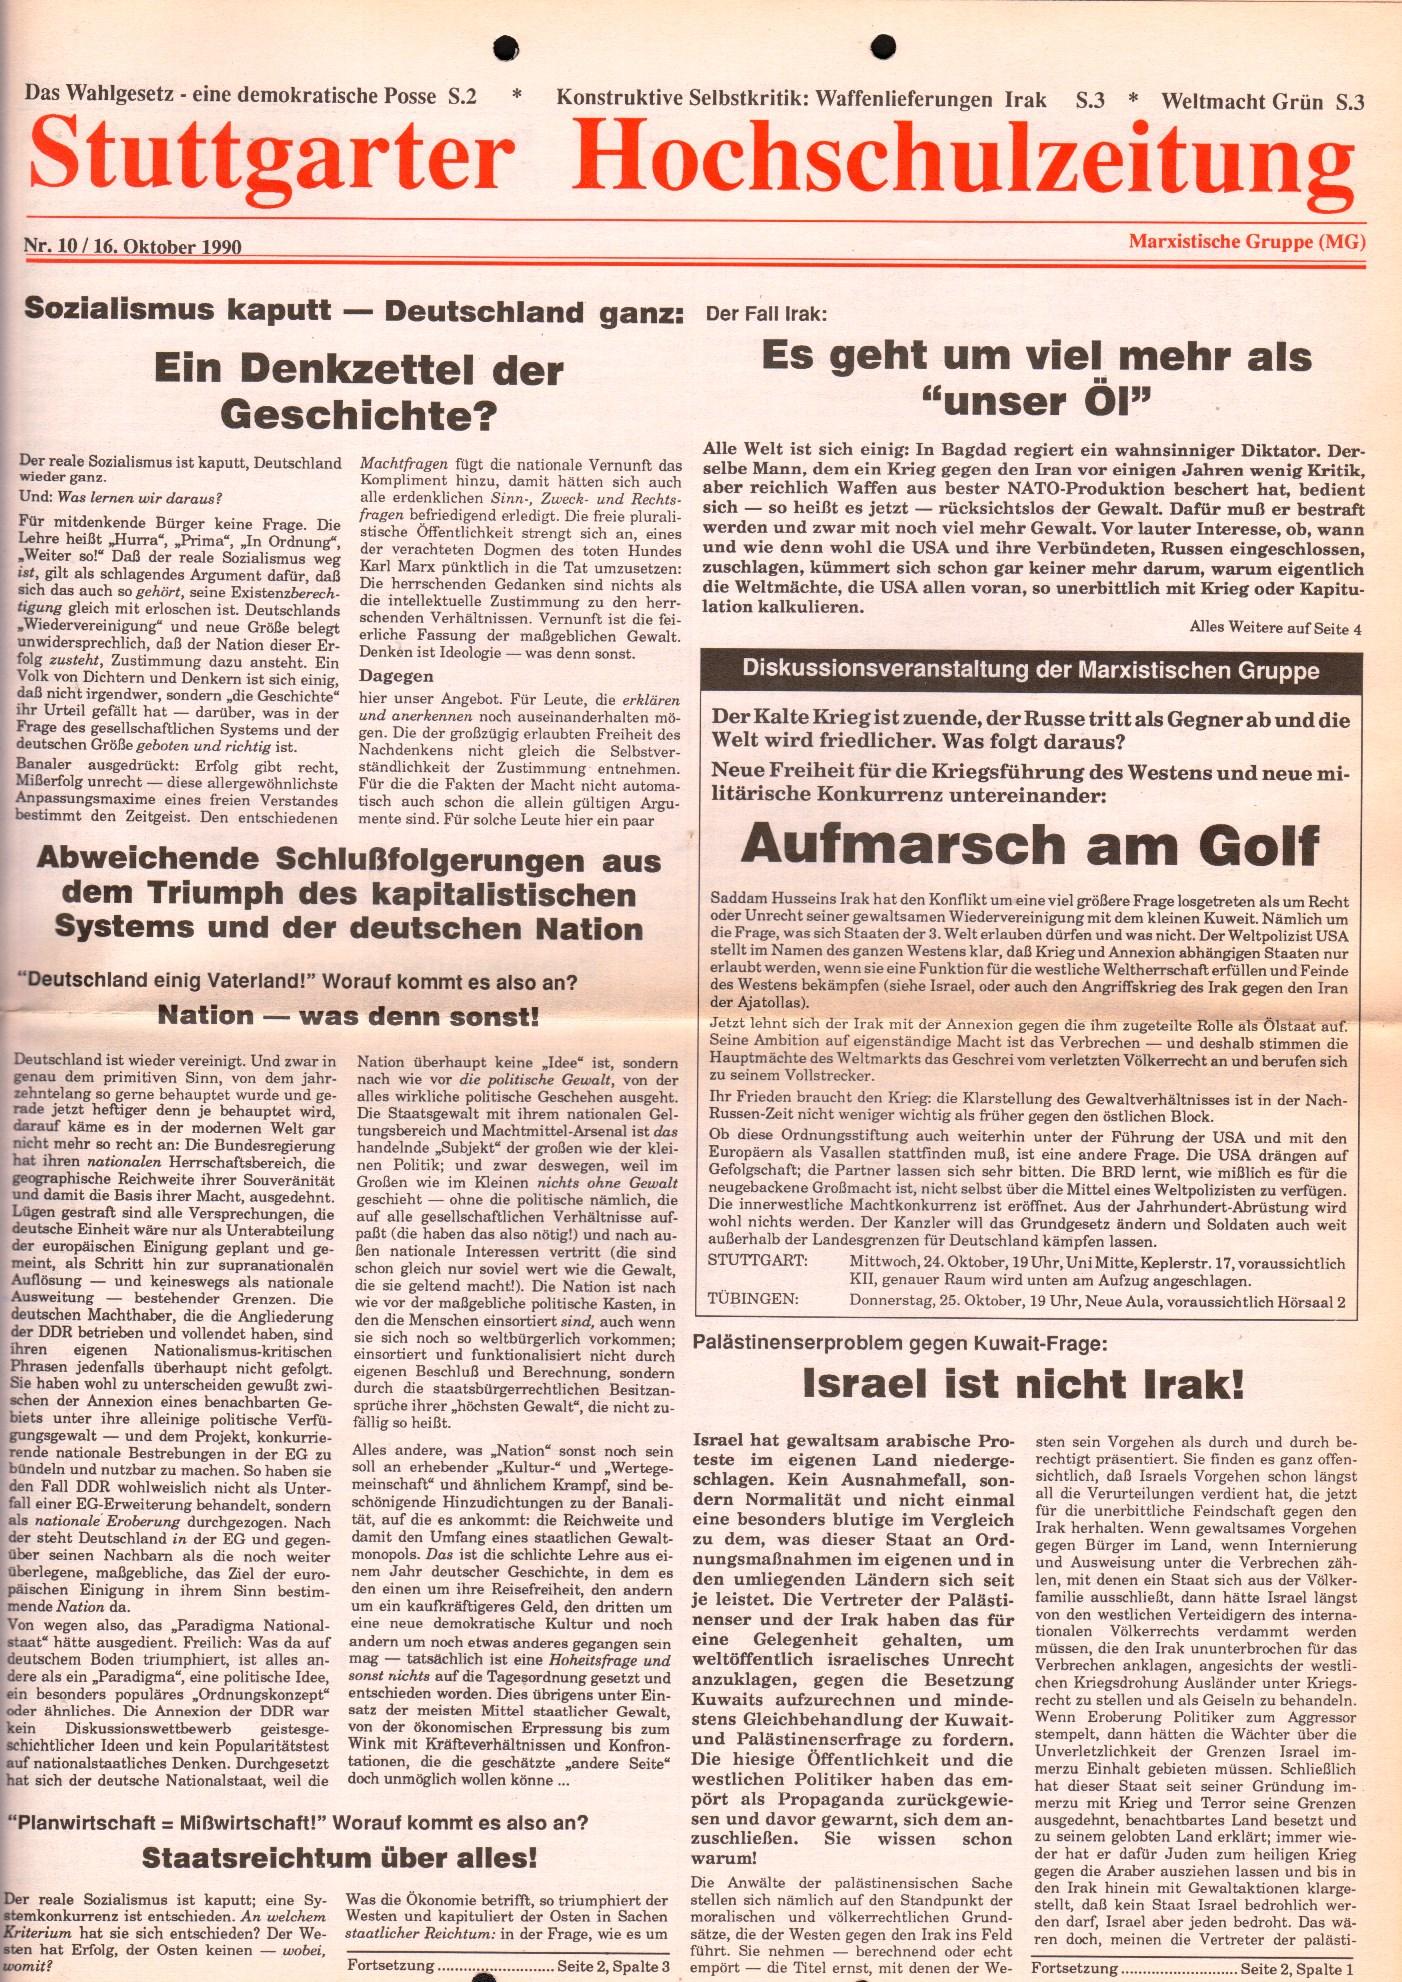 Stuttgart_MG_Hochschulzeitung_1990_10_01